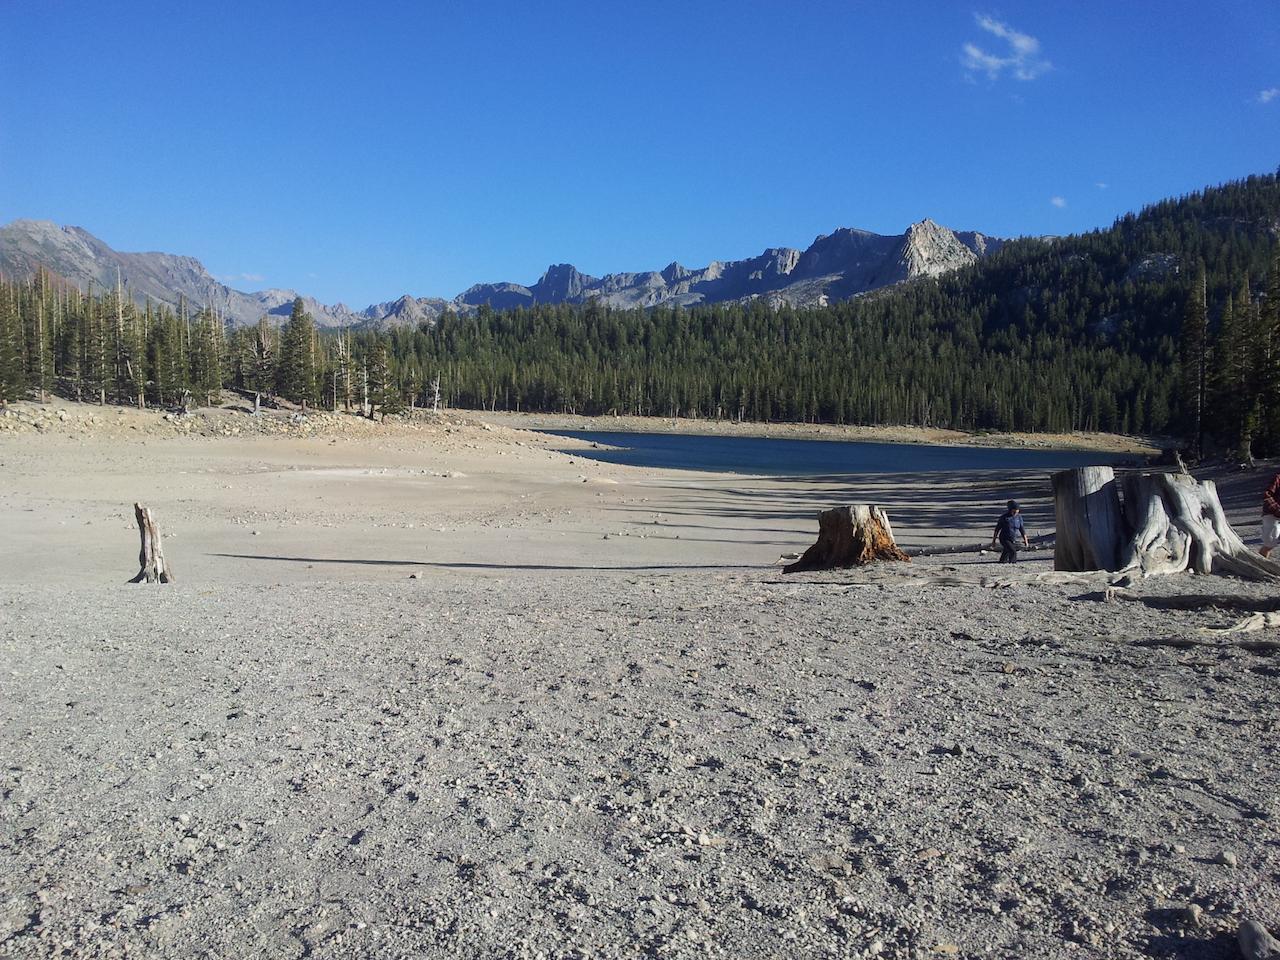 Horseshoe Lake, za hřebenem se skrývá John Muir wilderness